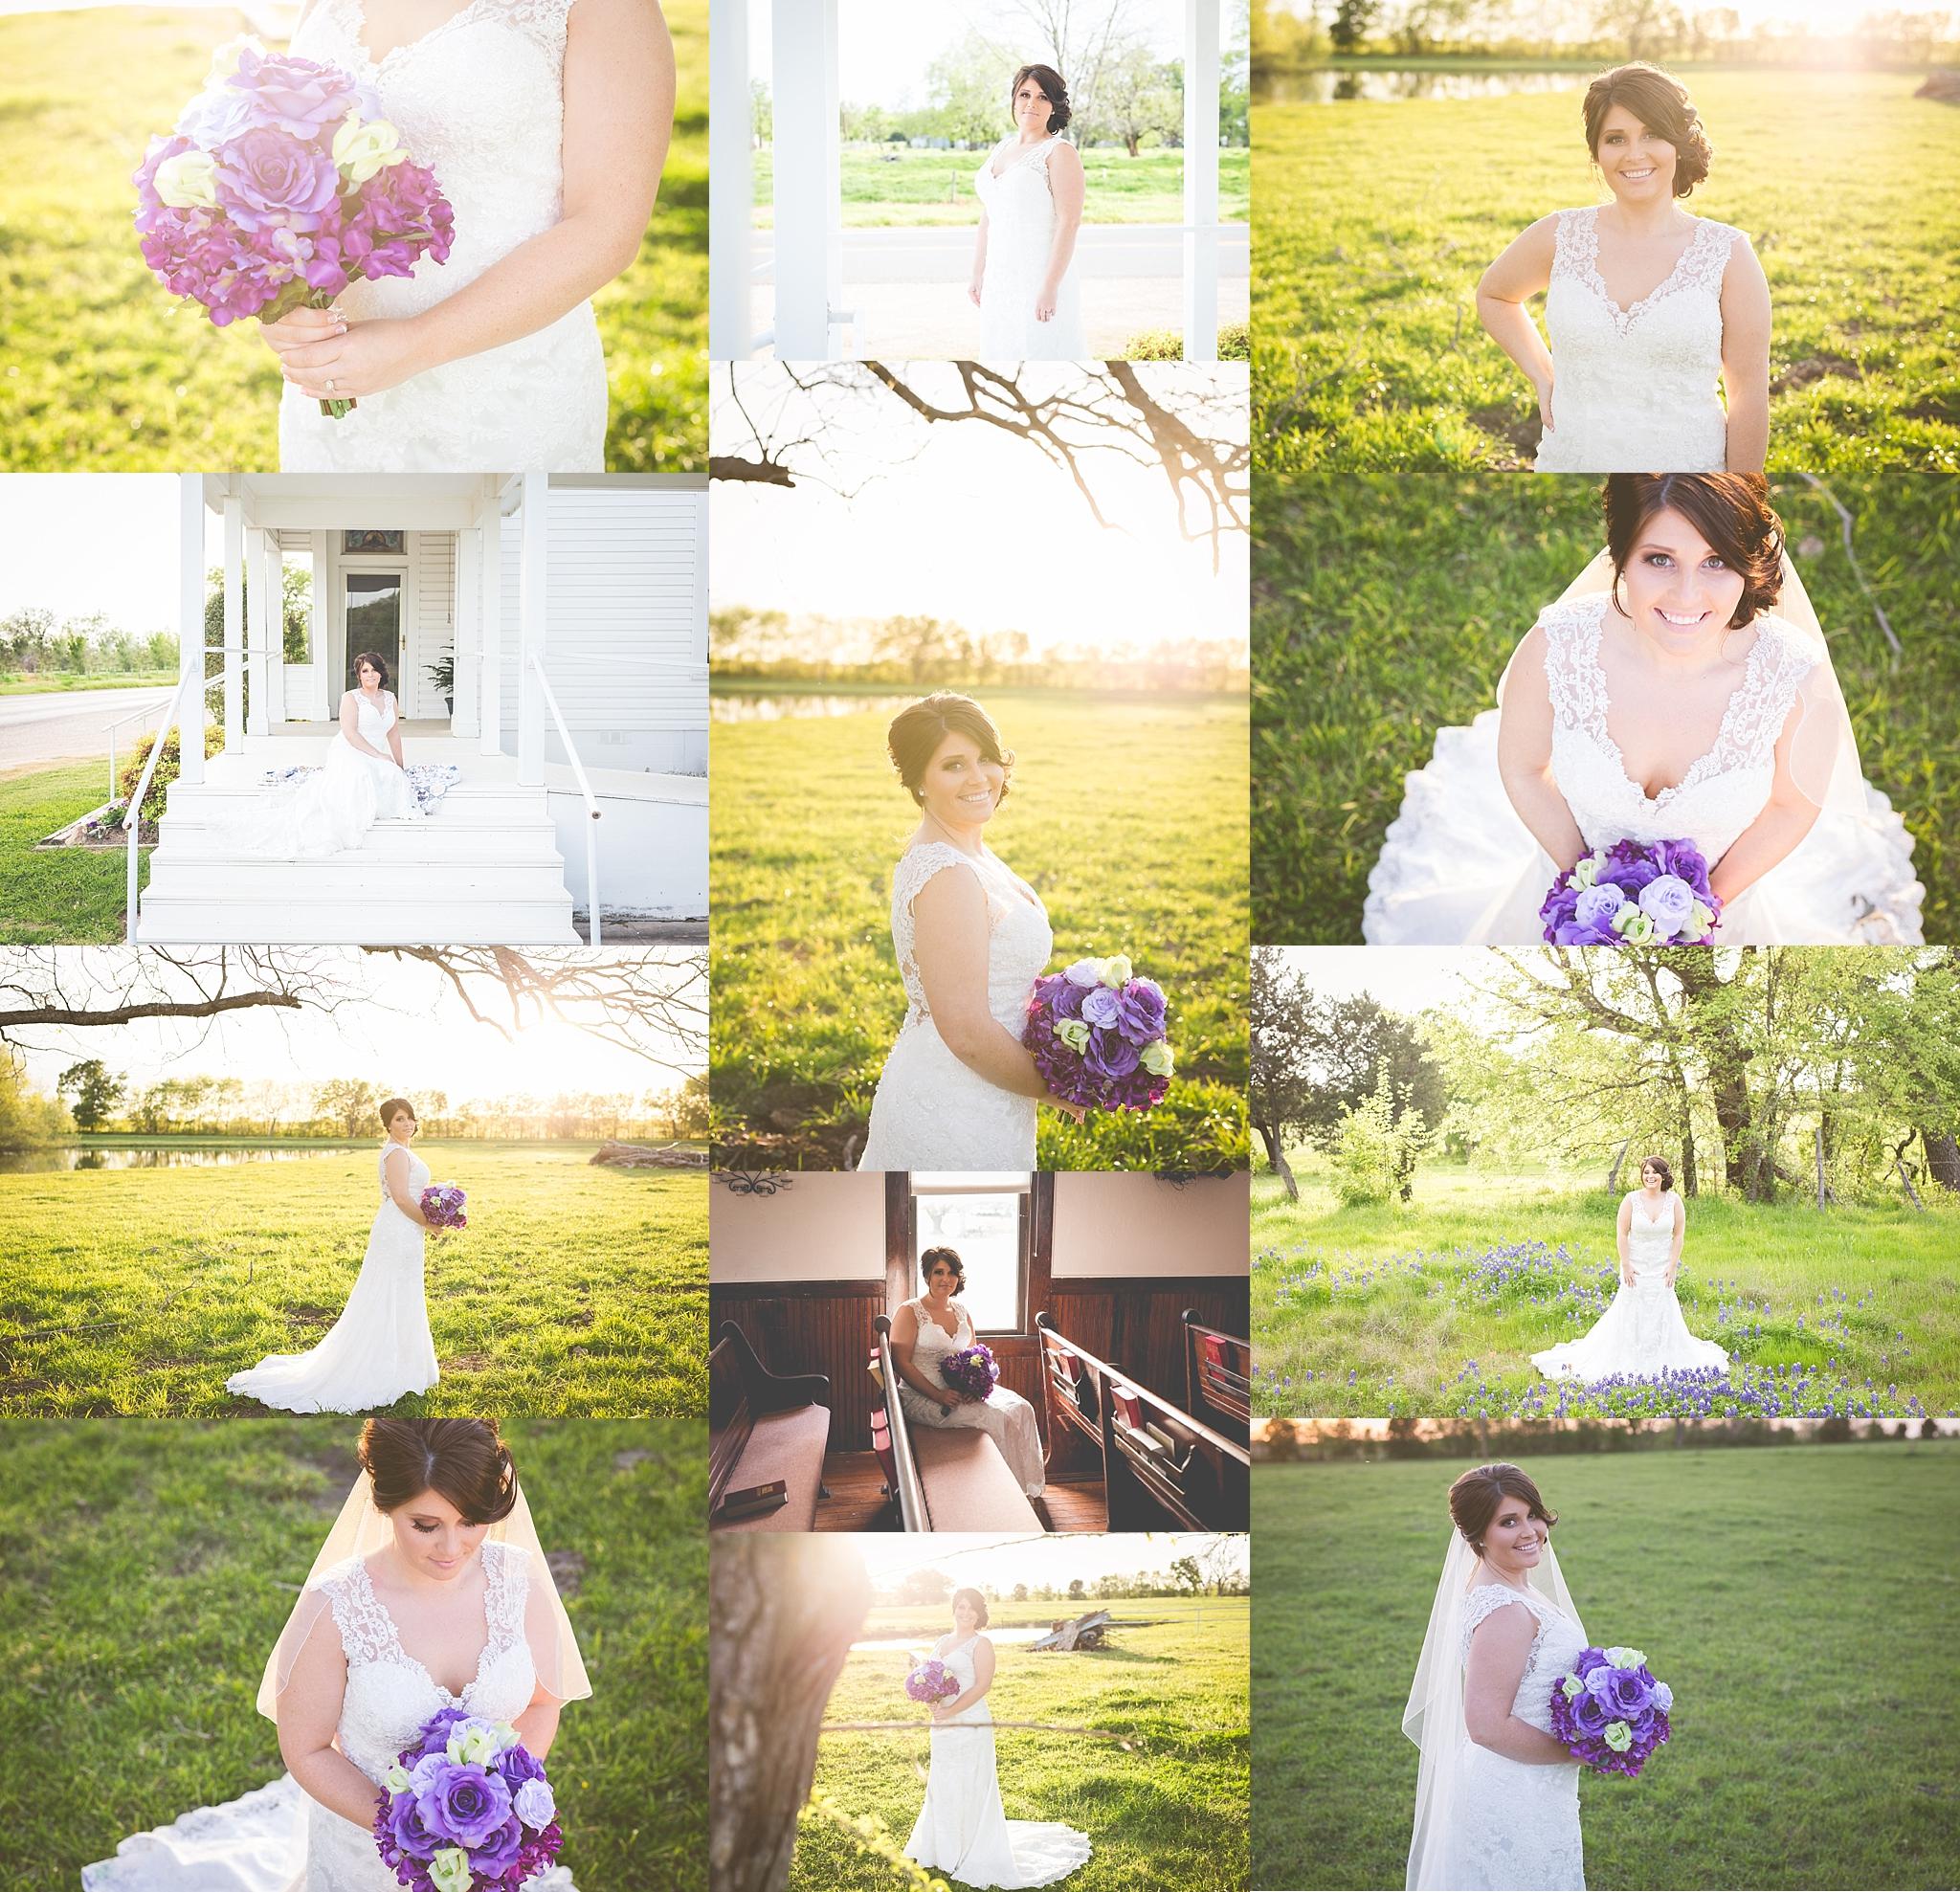 wedding-photos-springfield-missouri-lake-ozarkjefferson-city-columbia-como-missouri.jpg